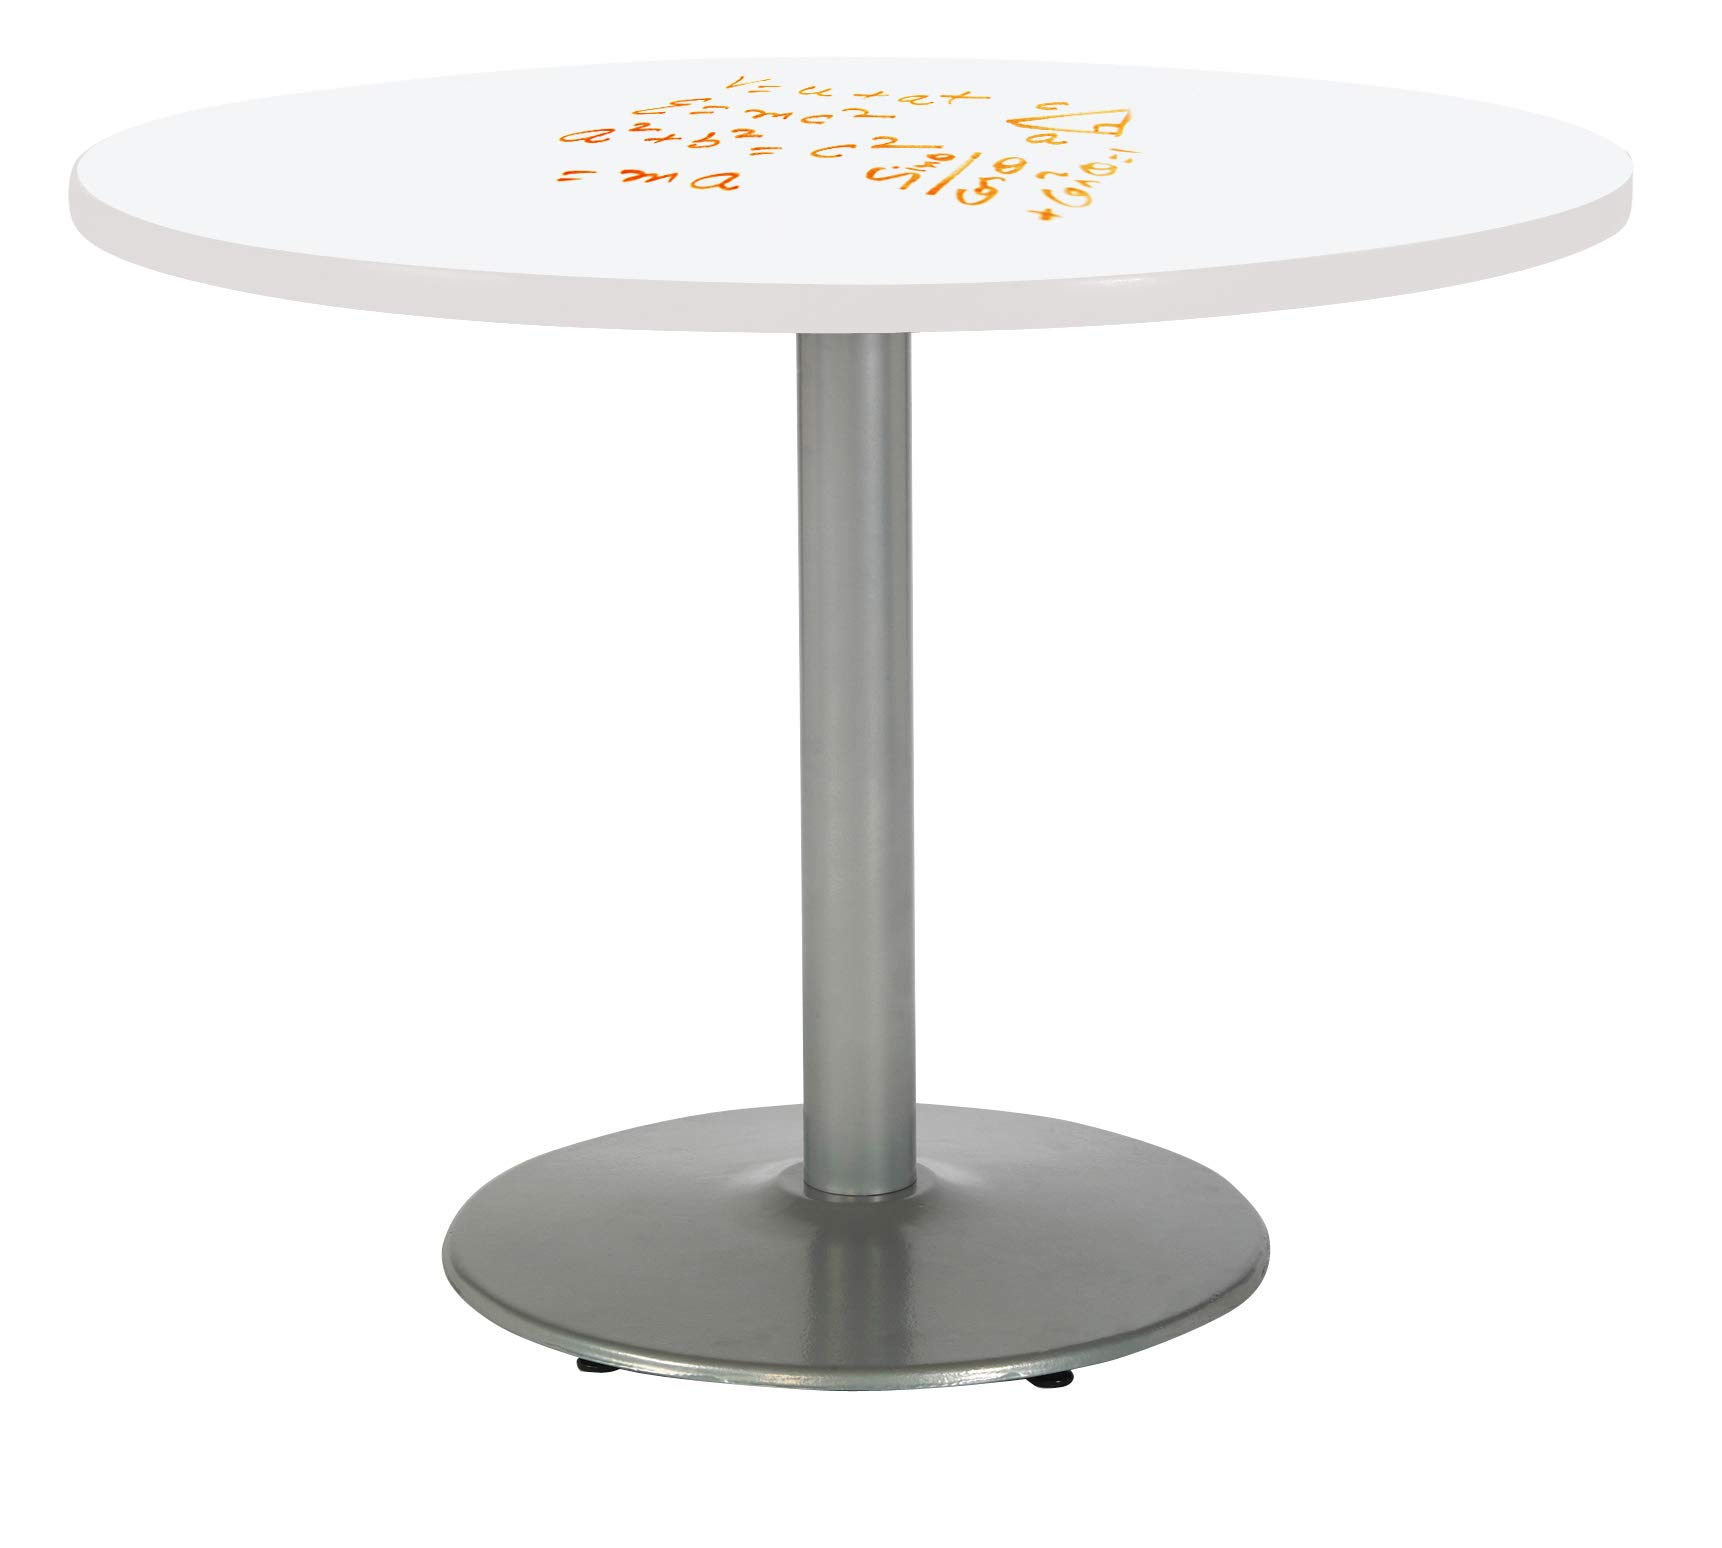 KFI T48RD-B1930-SL-3105-WH Mode Pedestal Table, 48'', White